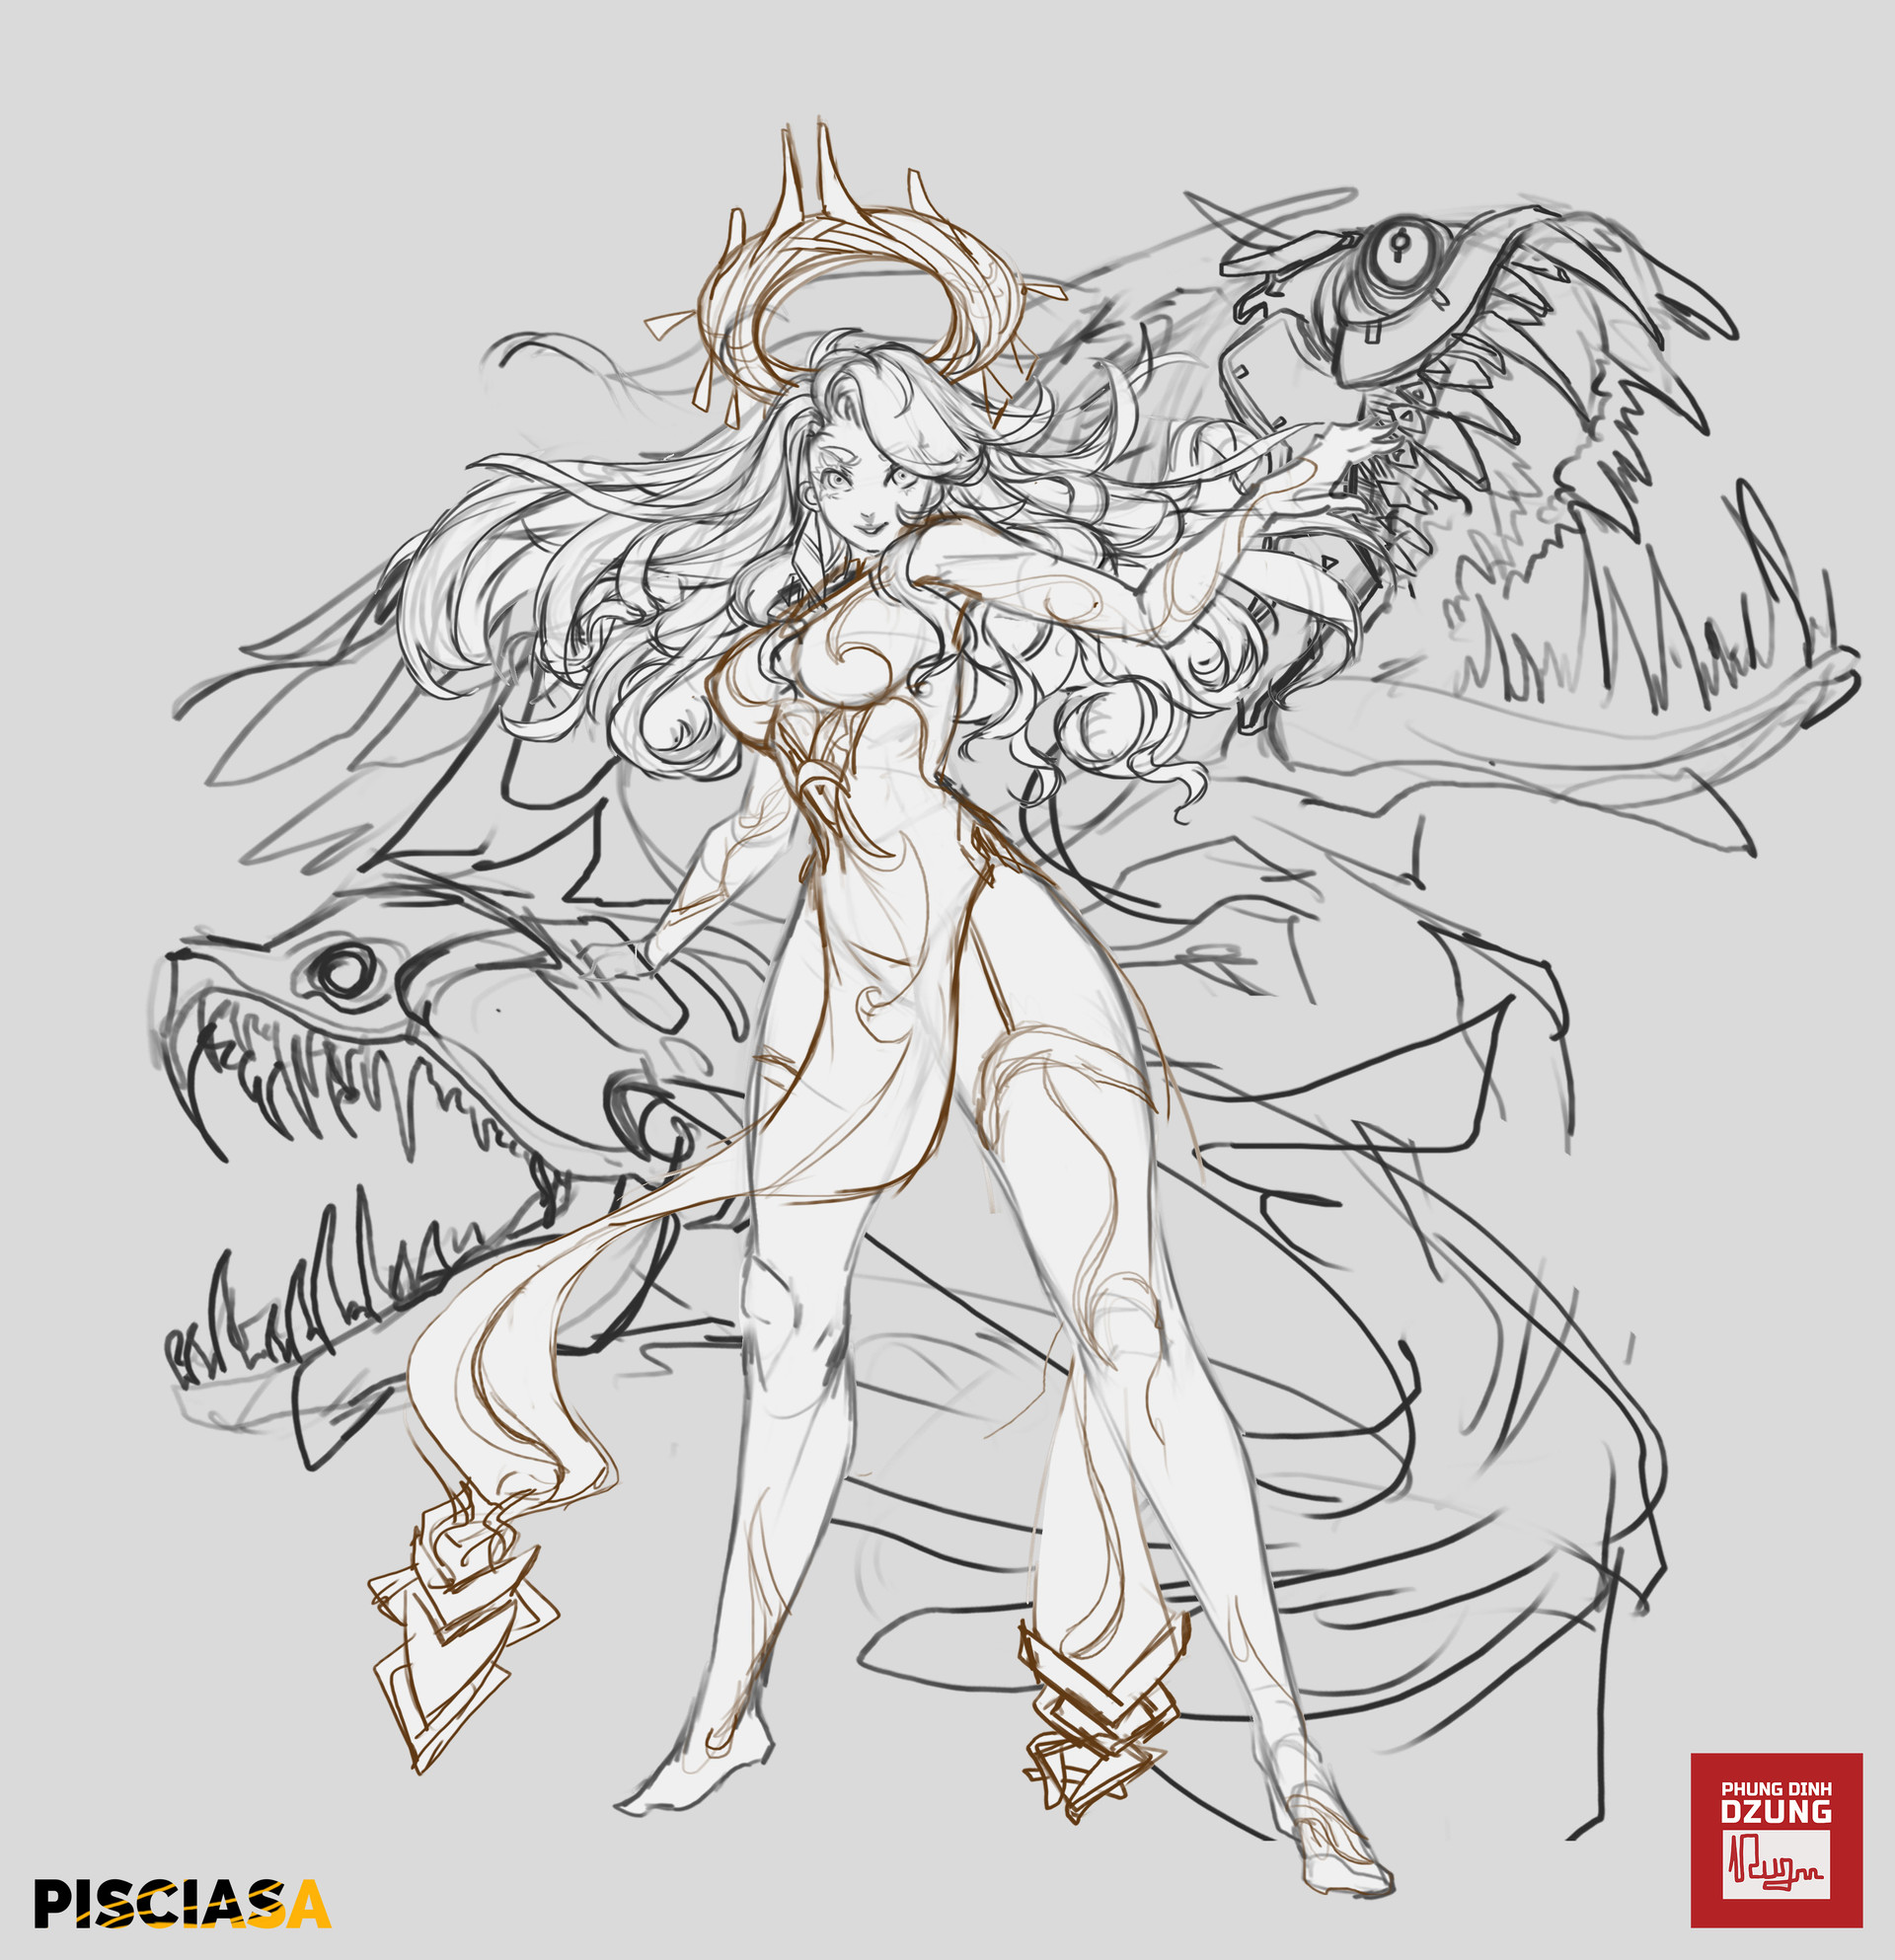 Dzung phung dinh pisciasa conceptdraft 001